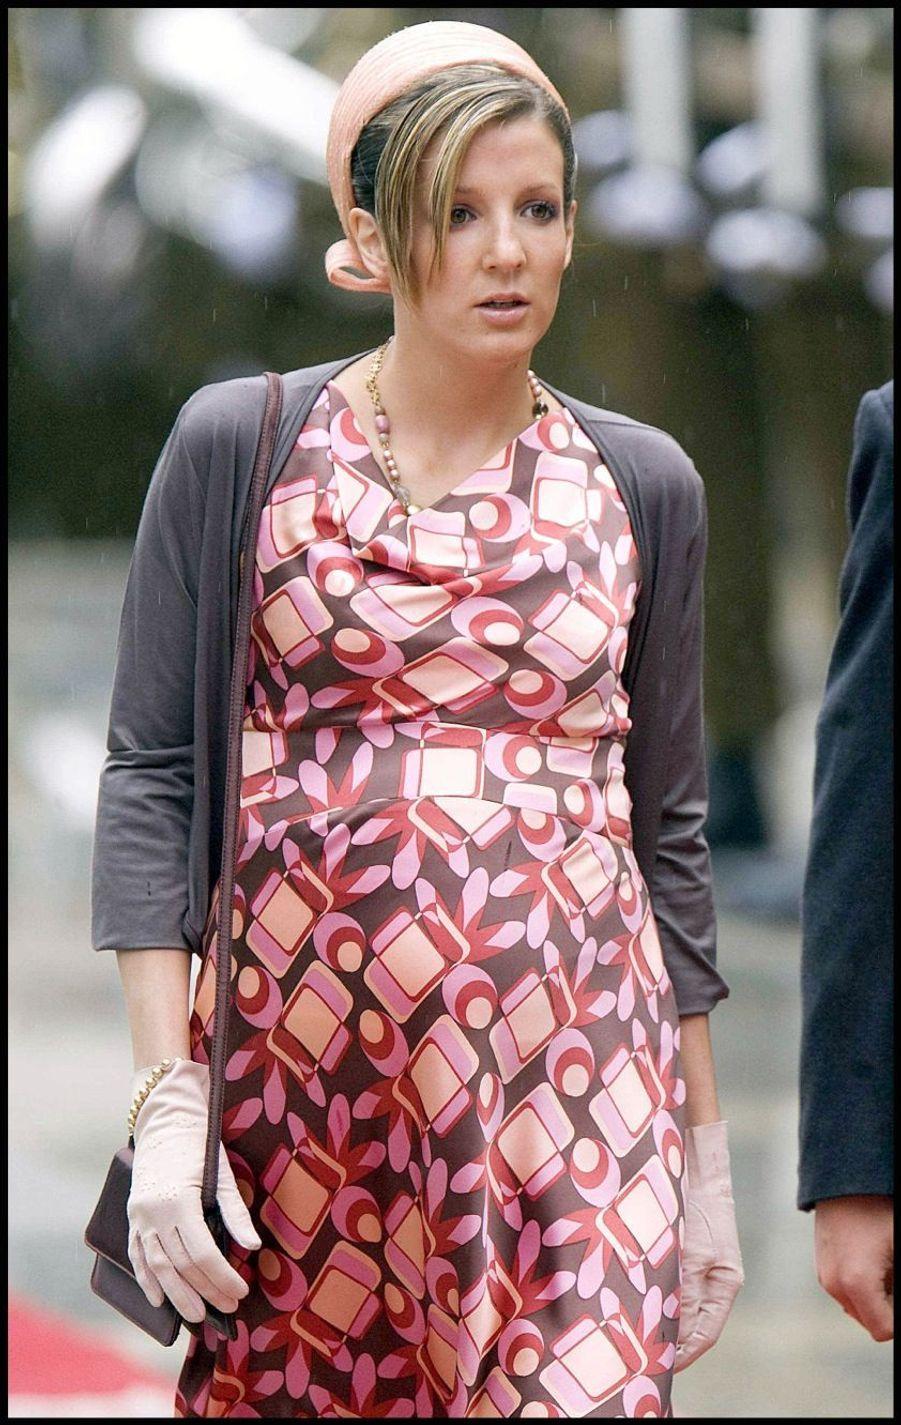 La princesse Tessy du Luxembourg, enceinte de son fils Noah, en 2007